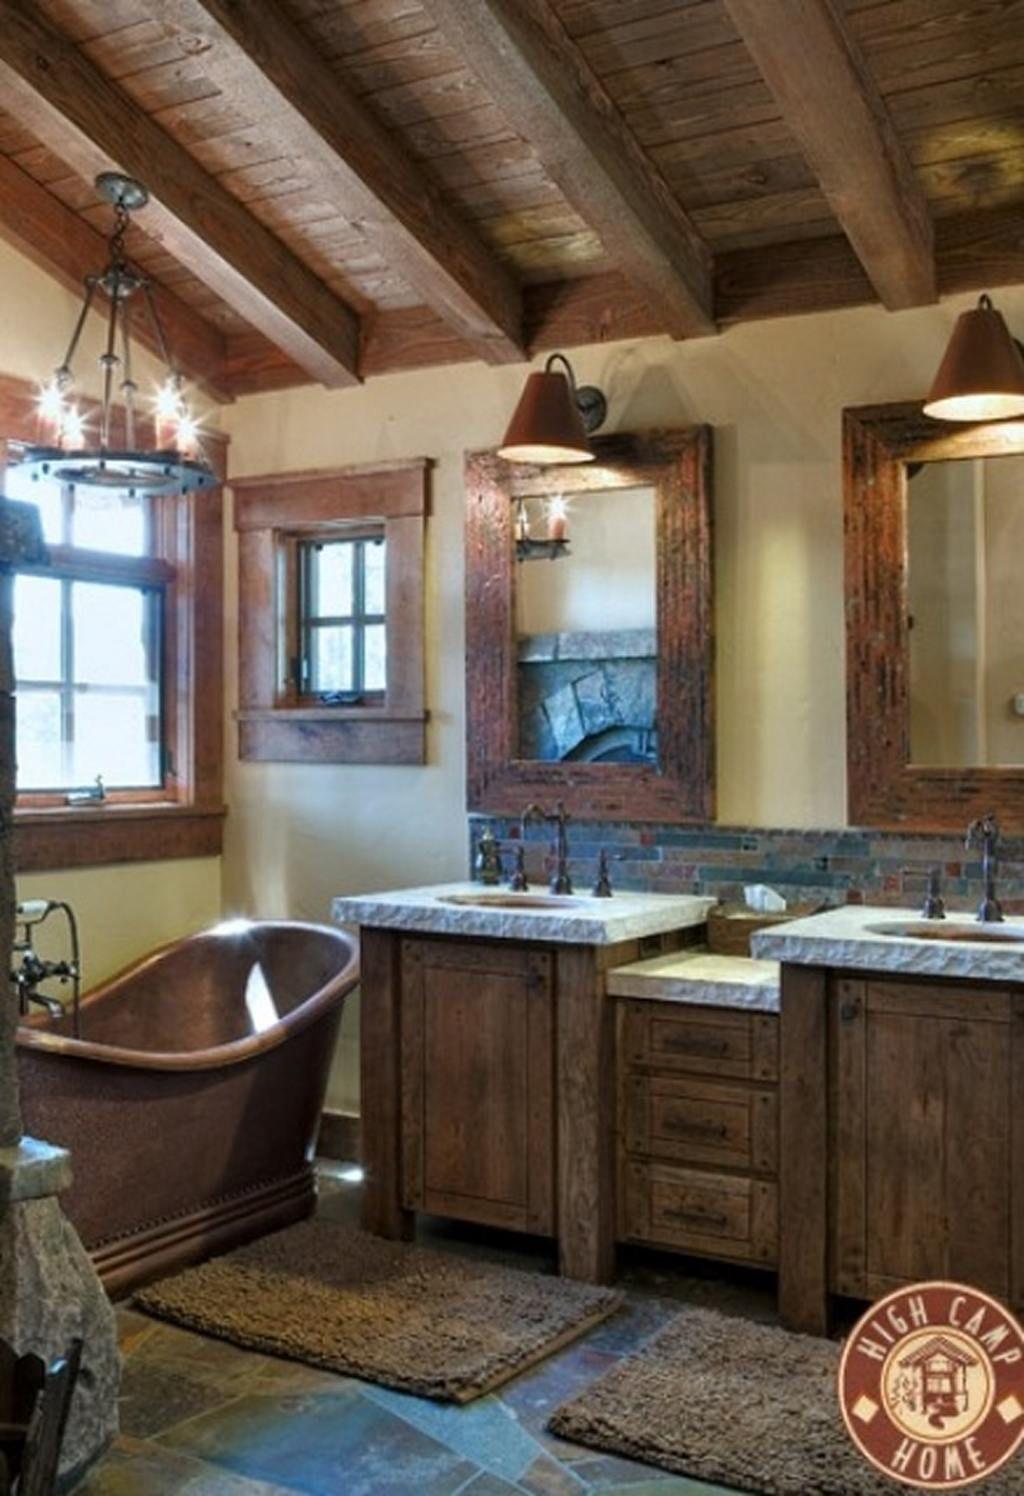 Classic Rustic Barn Bathroom With Double Wooden Vanity